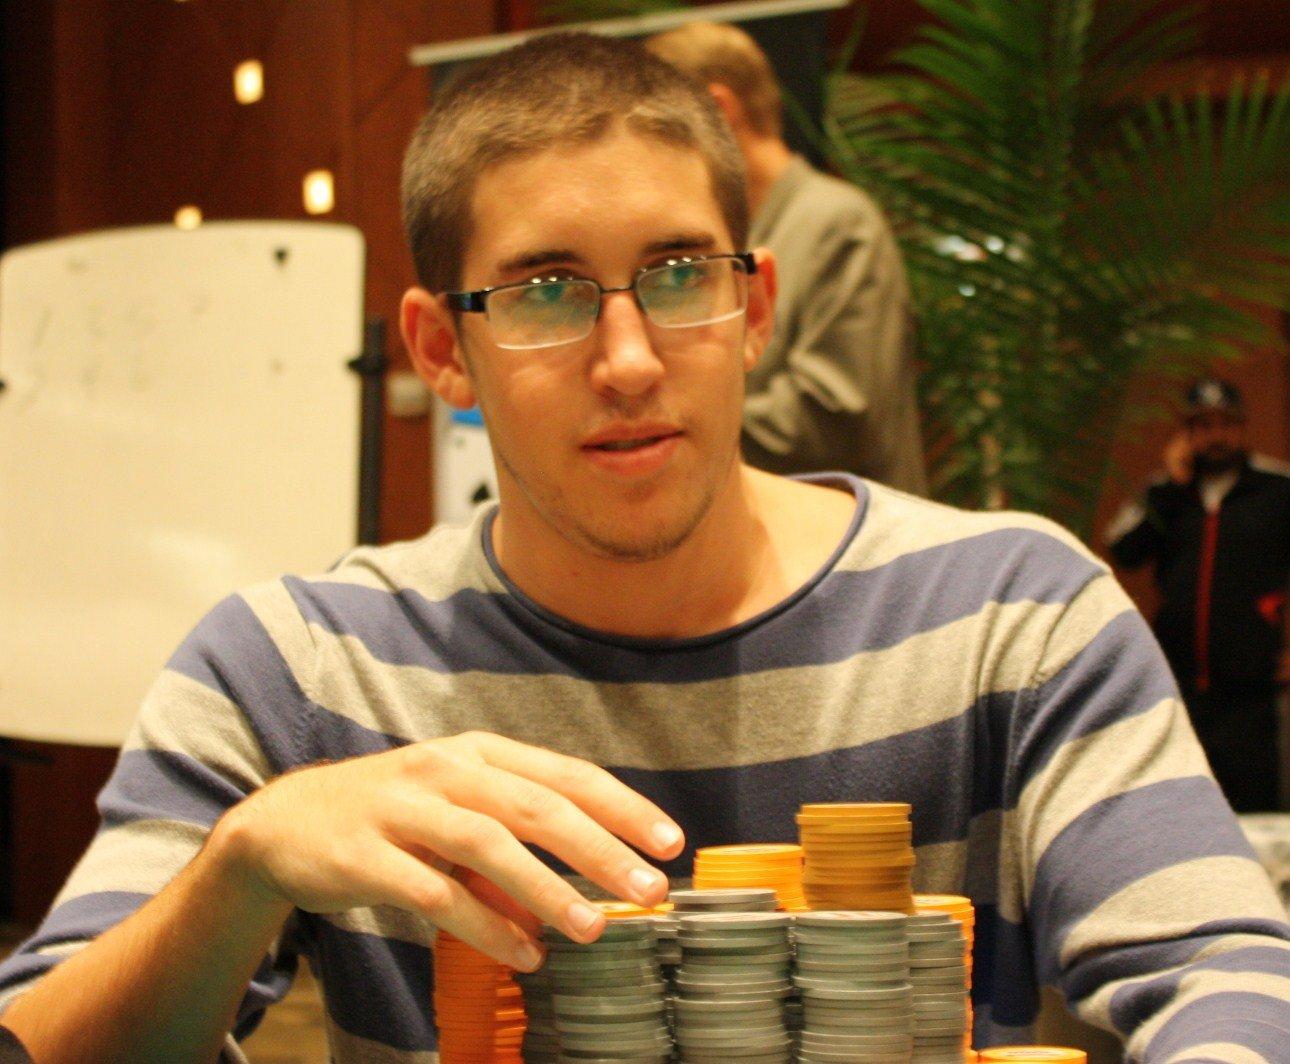 Daniel colman poker tips